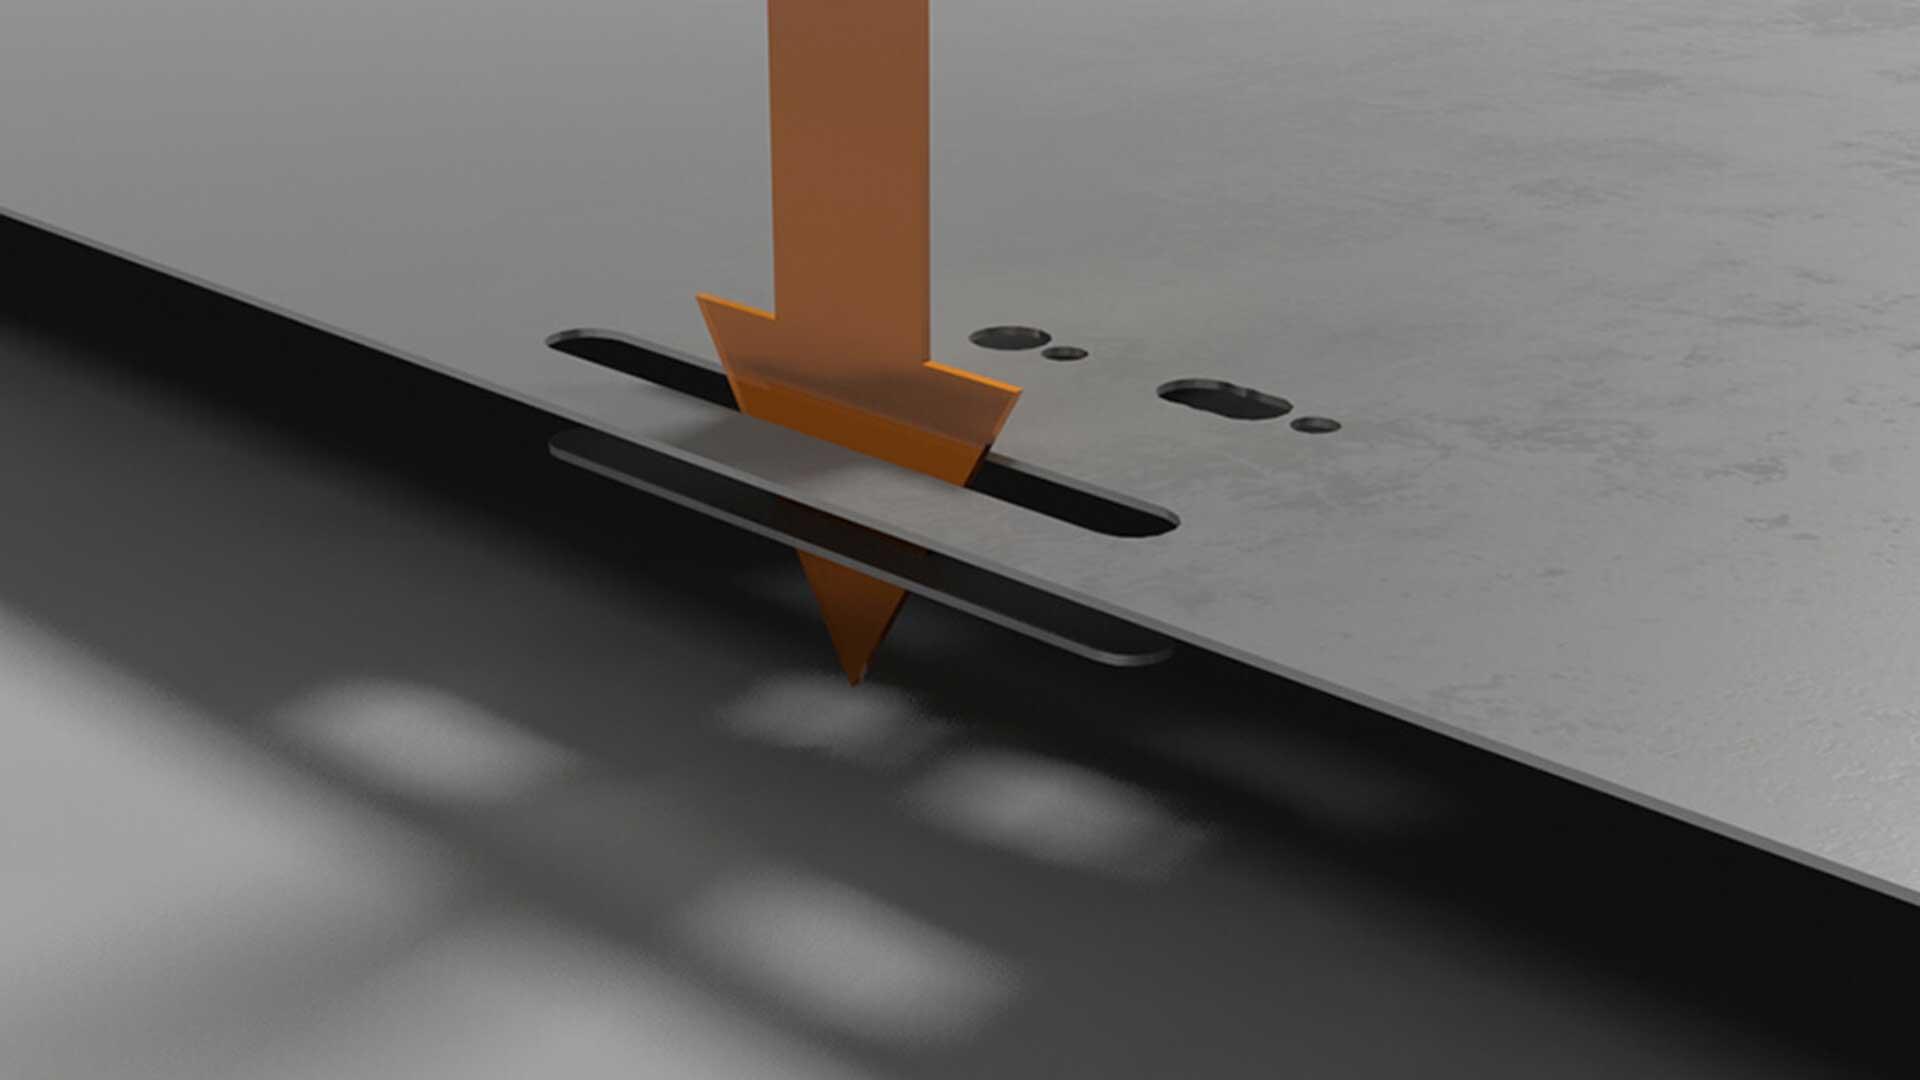 wemo-punching-technology-zoom-in.jpg